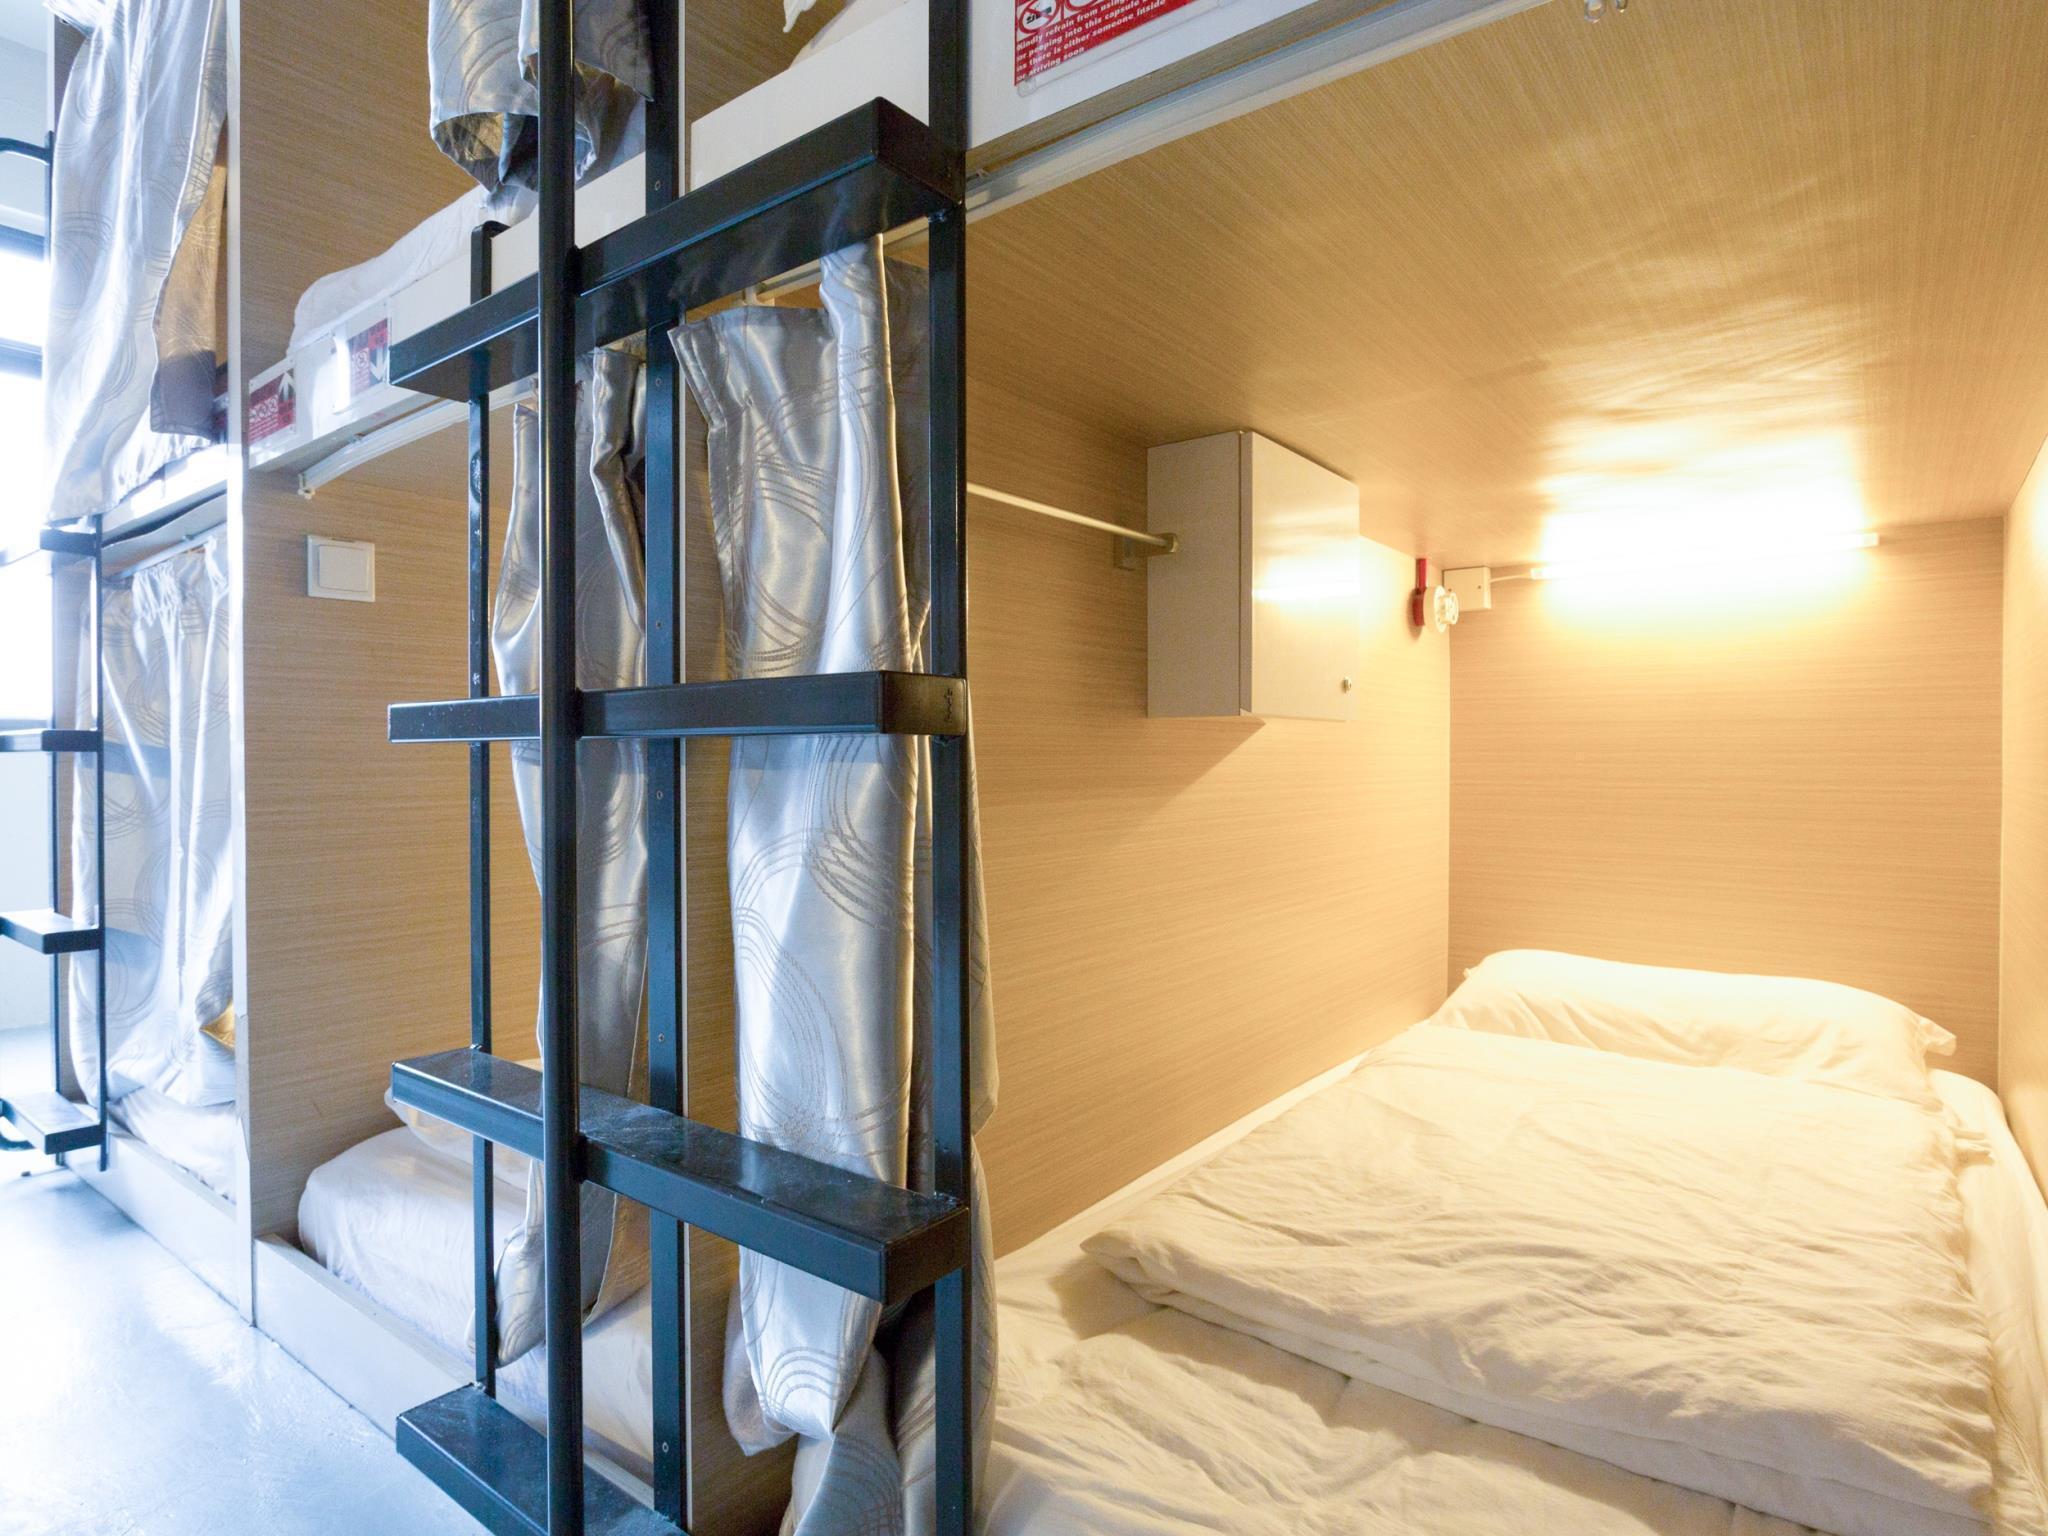 Central 65 Hostel